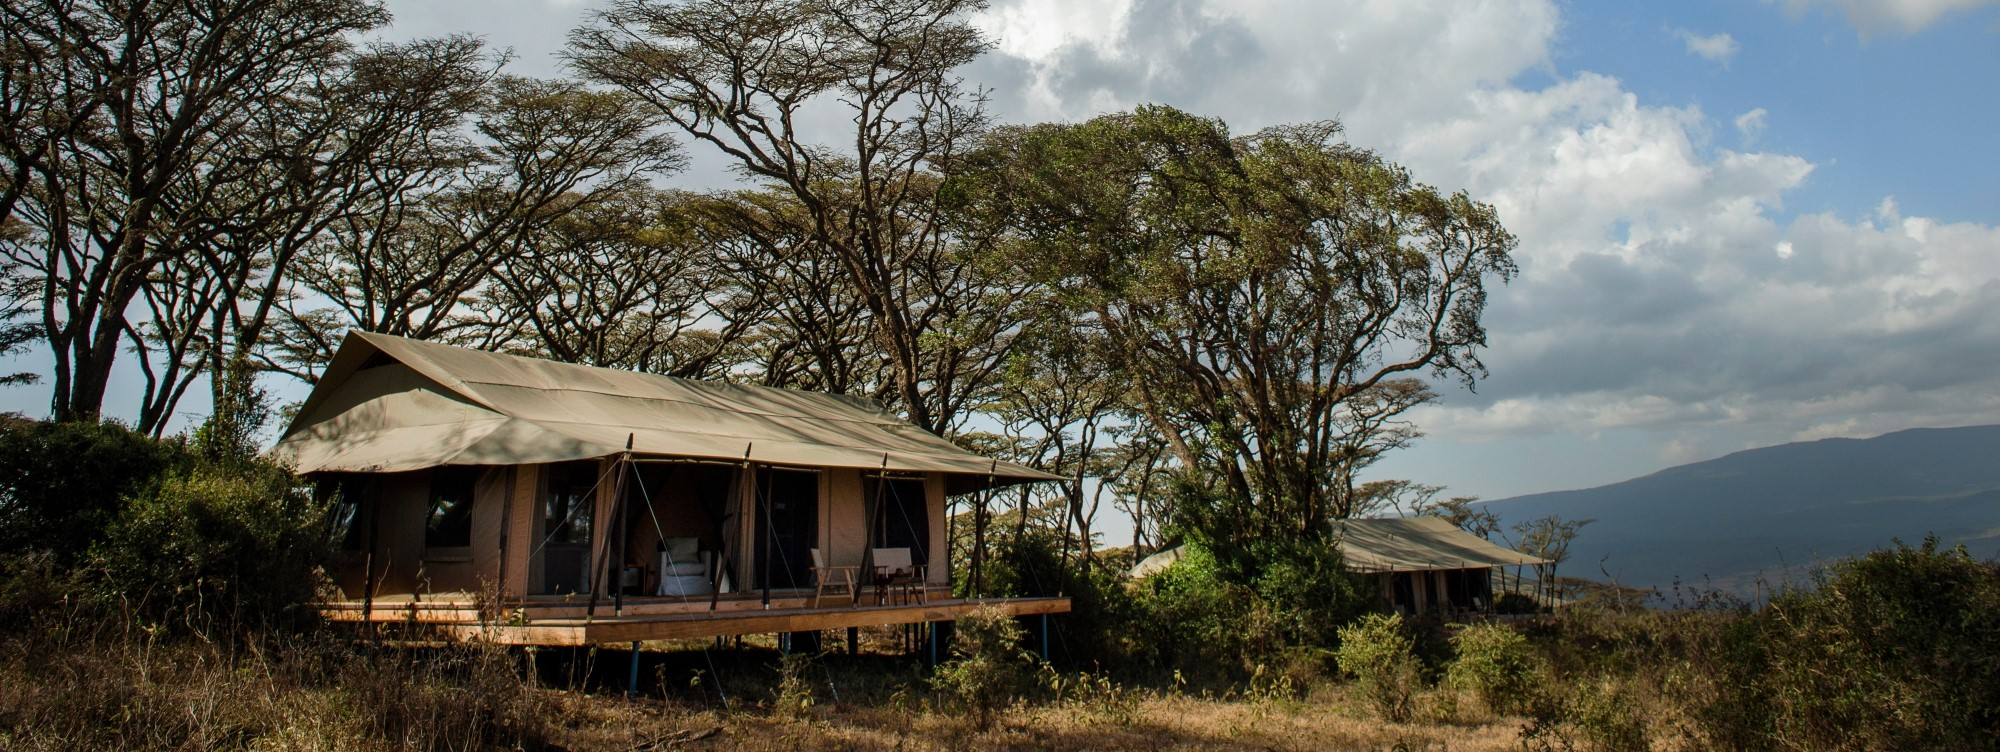 entamanu-ngorongoro-tanzania